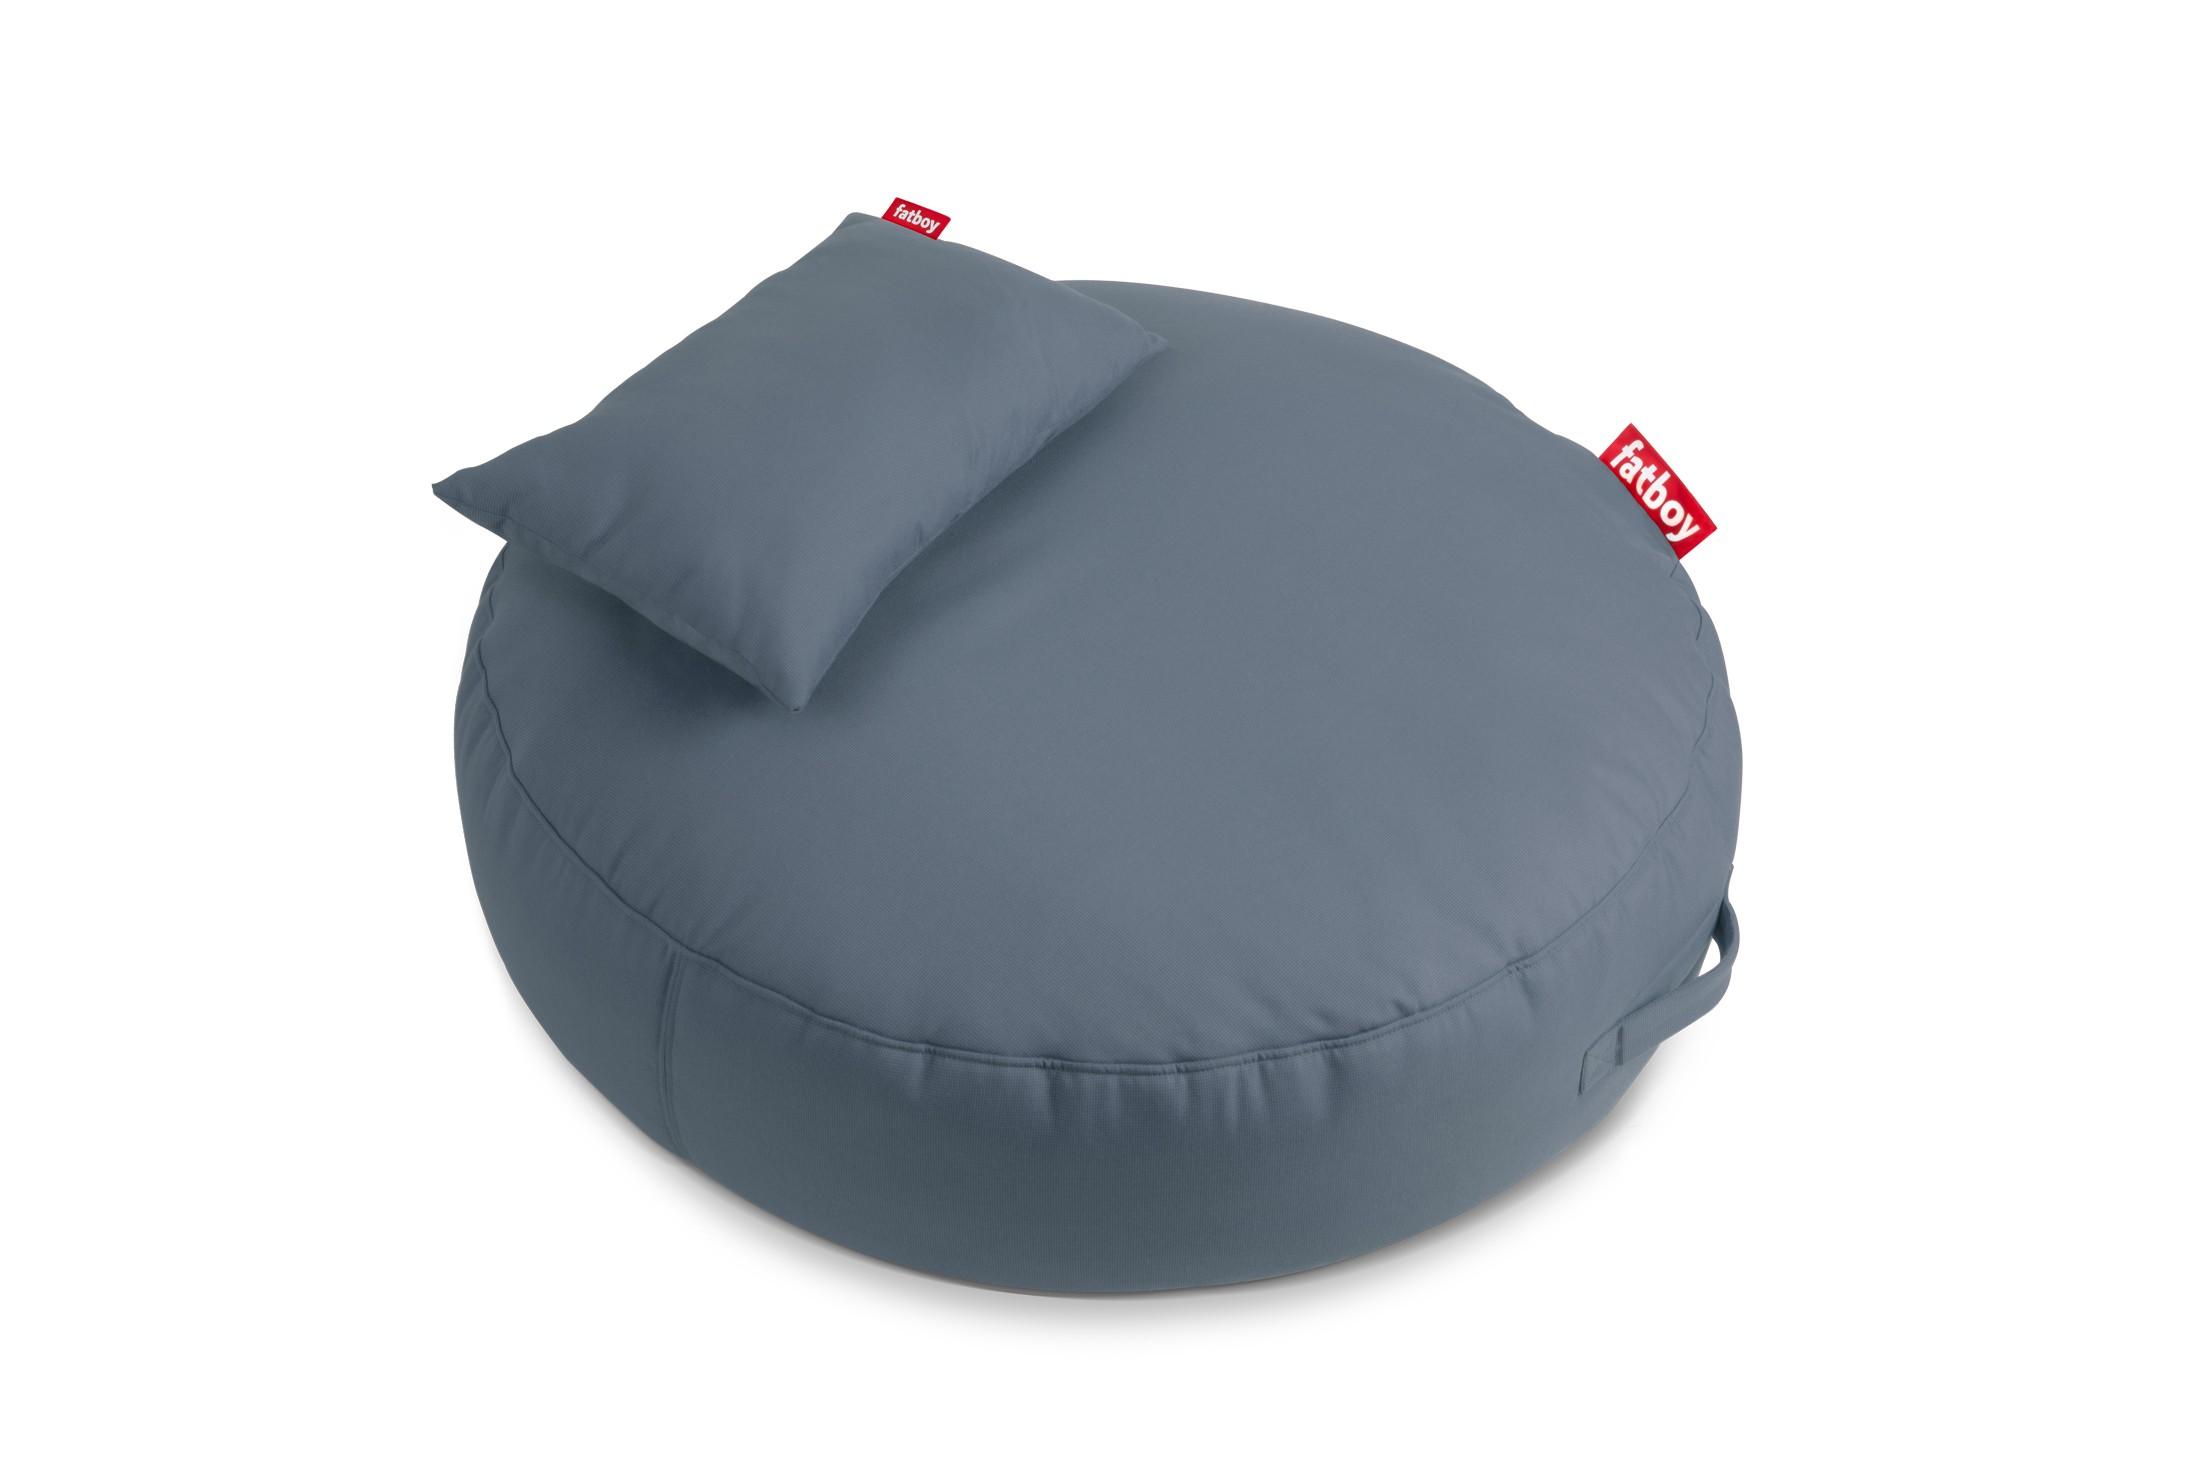 pouf pupillow de fatboy steel blue. Black Bedroom Furniture Sets. Home Design Ideas